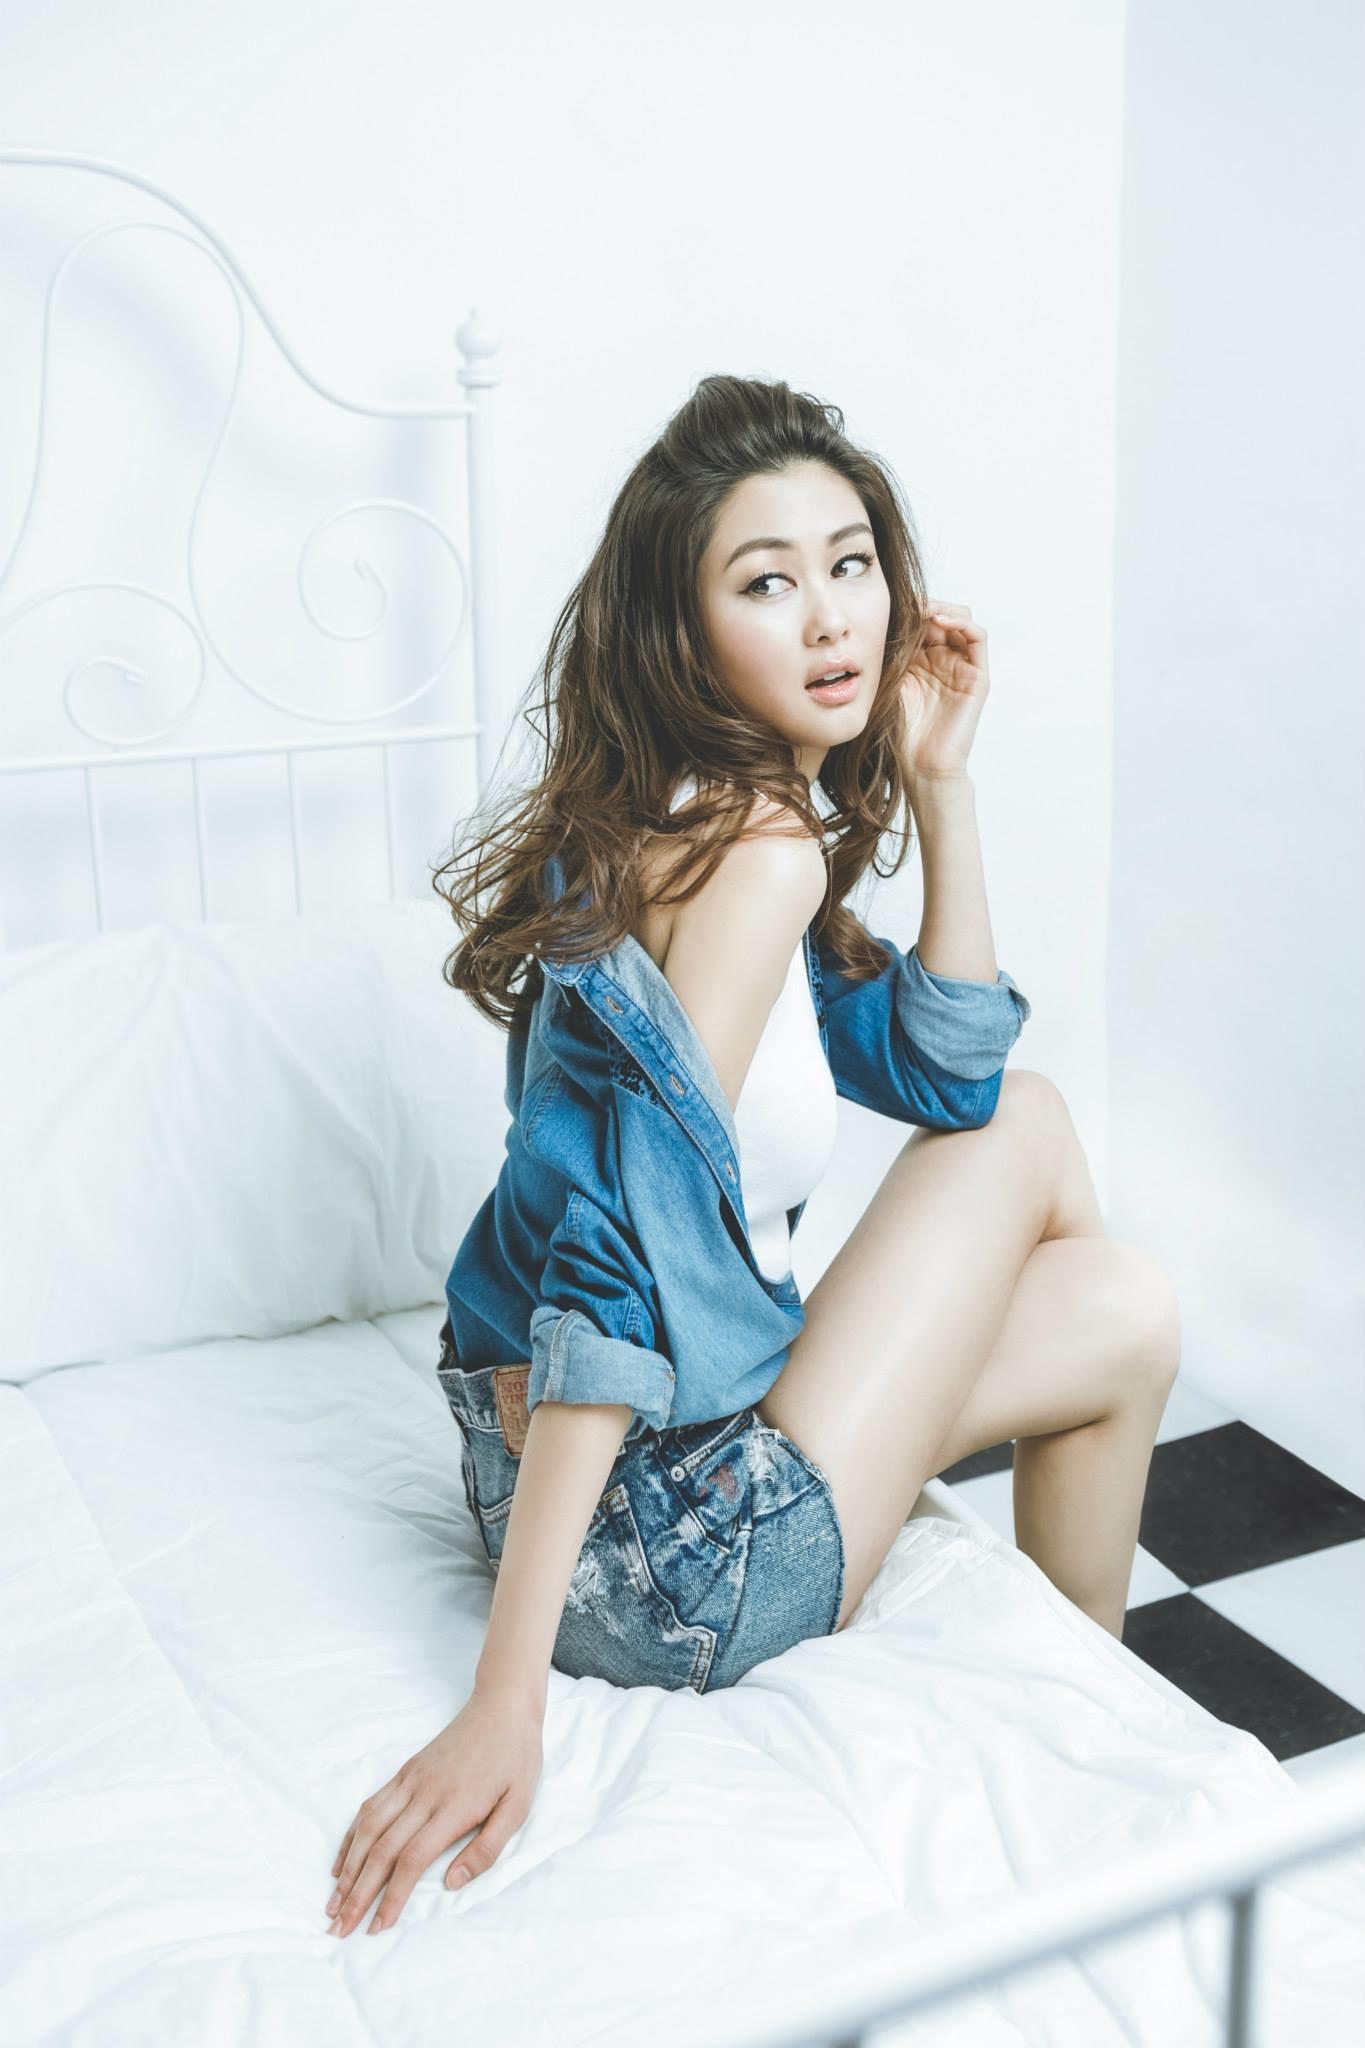 岑麗香 - Dicky Manana photographer . DM studio